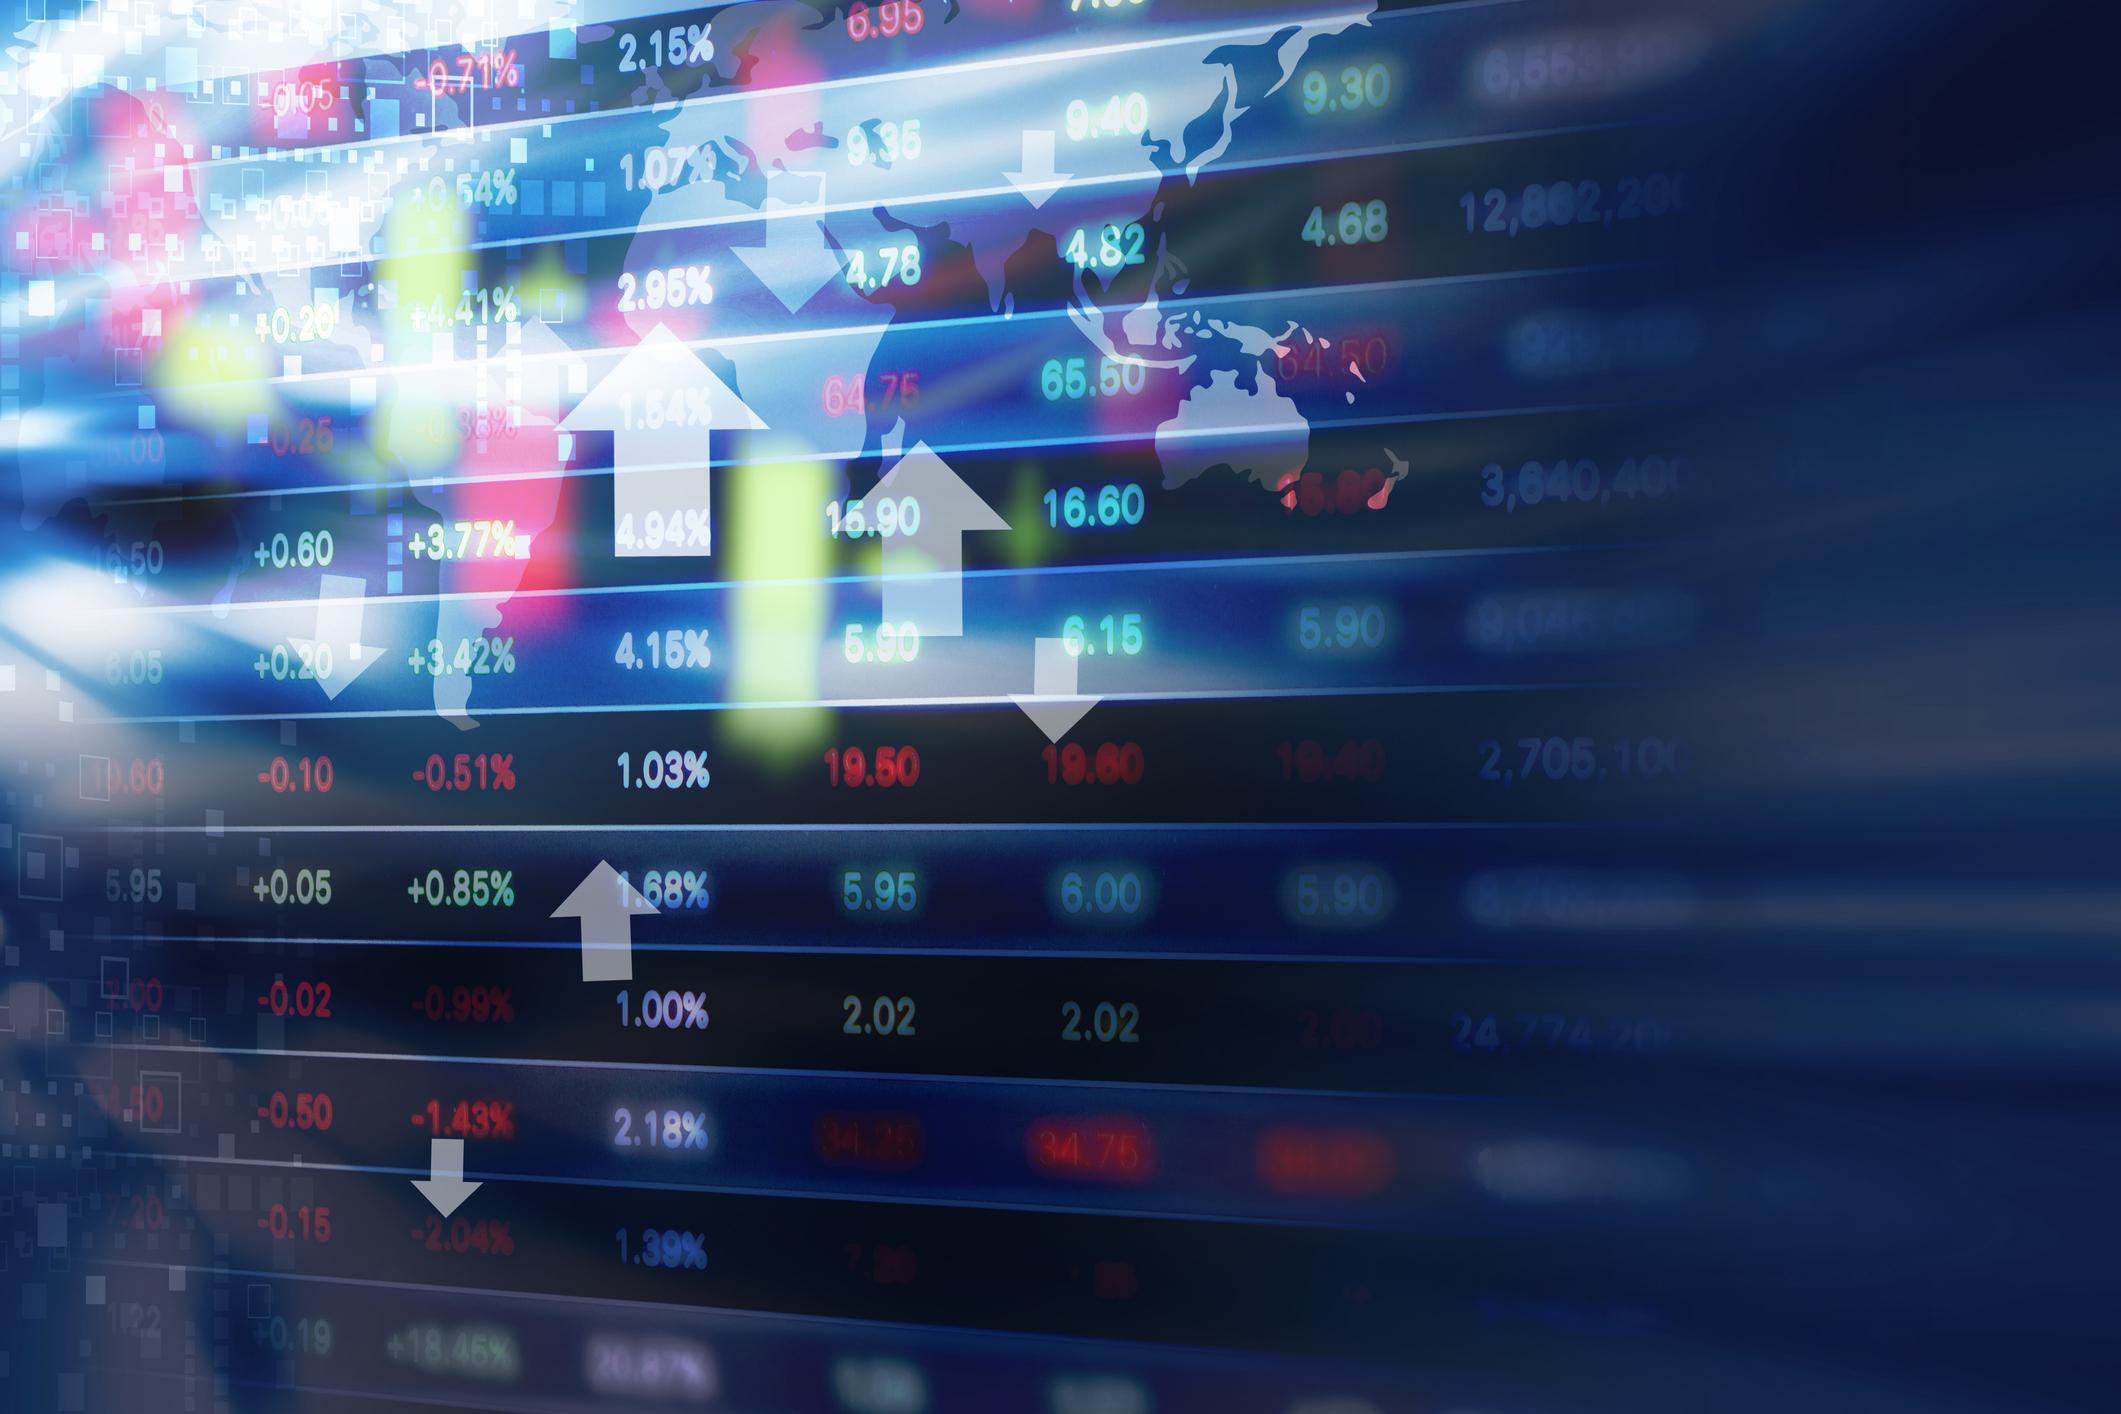 Digital stock readout